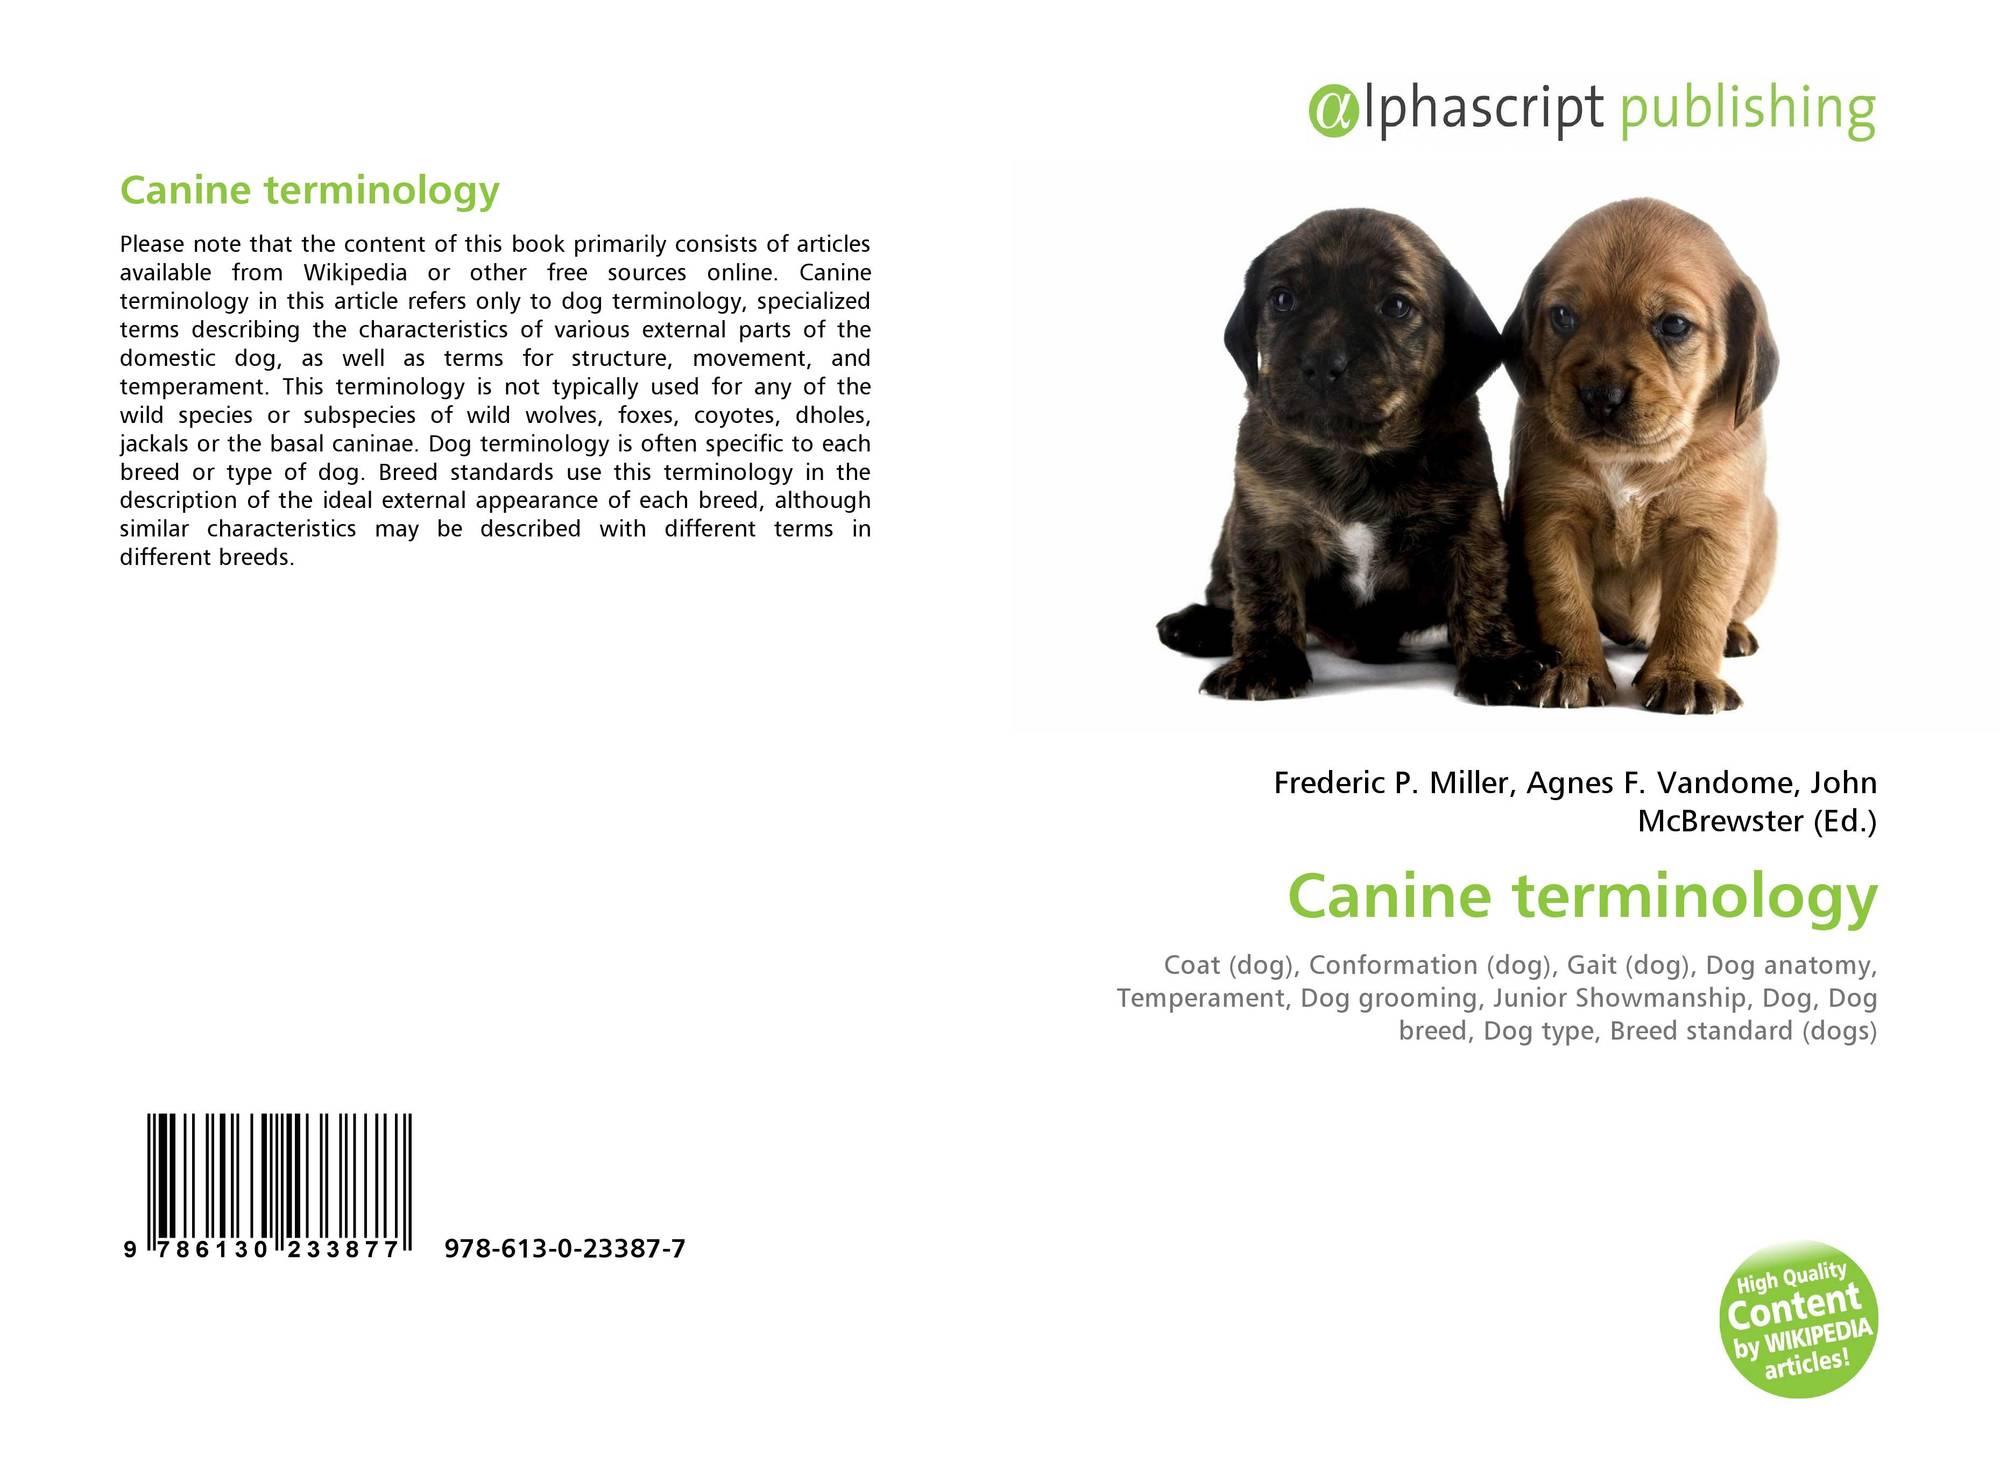 Canine terminology, 978-613-0-23387-7, 6130233876 ,9786130233877